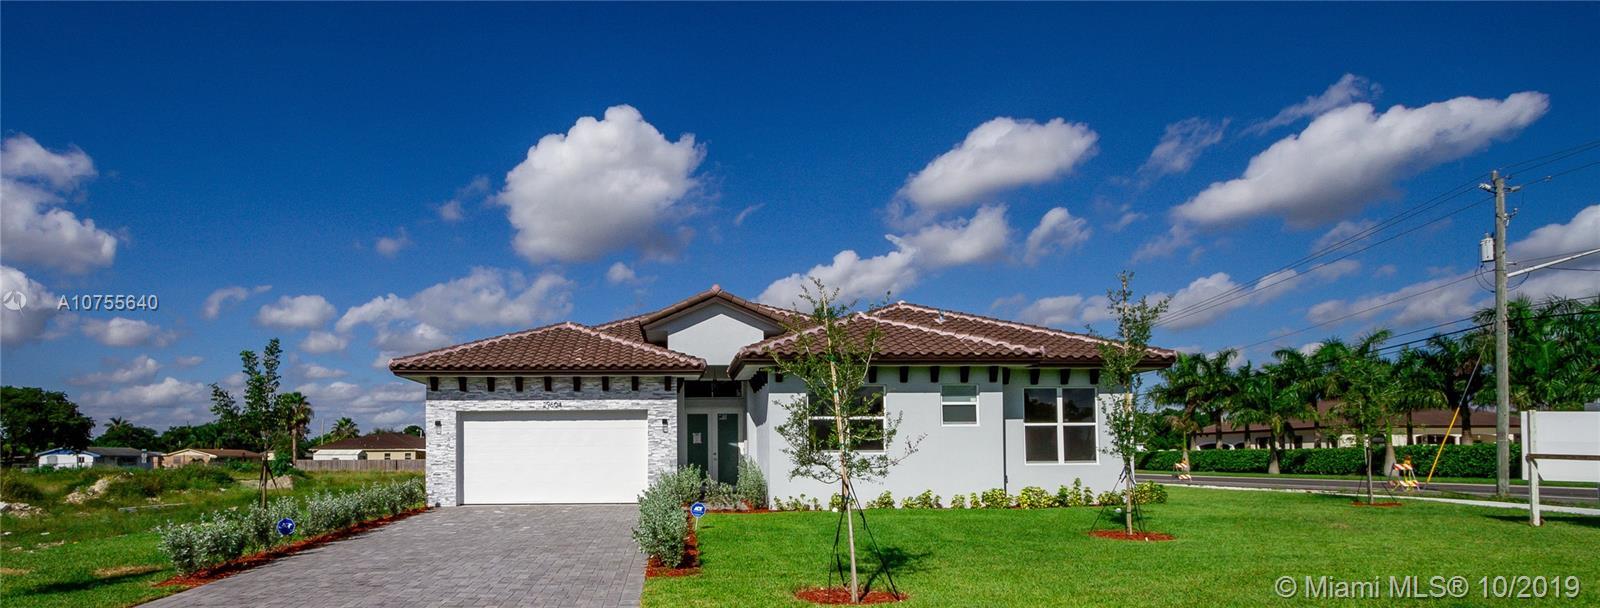 29643 SW 169 AVE, Homestead, Florida